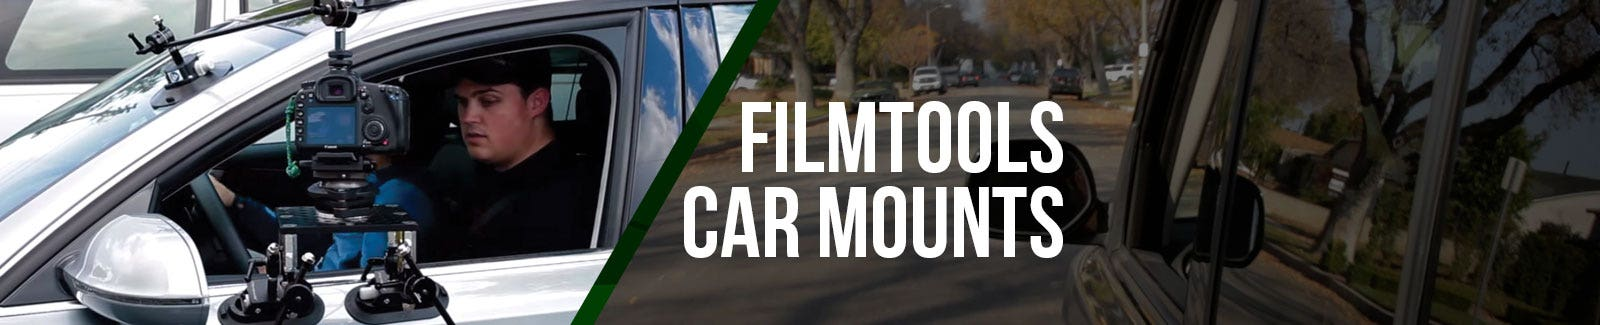 Car Mounts Exclusives